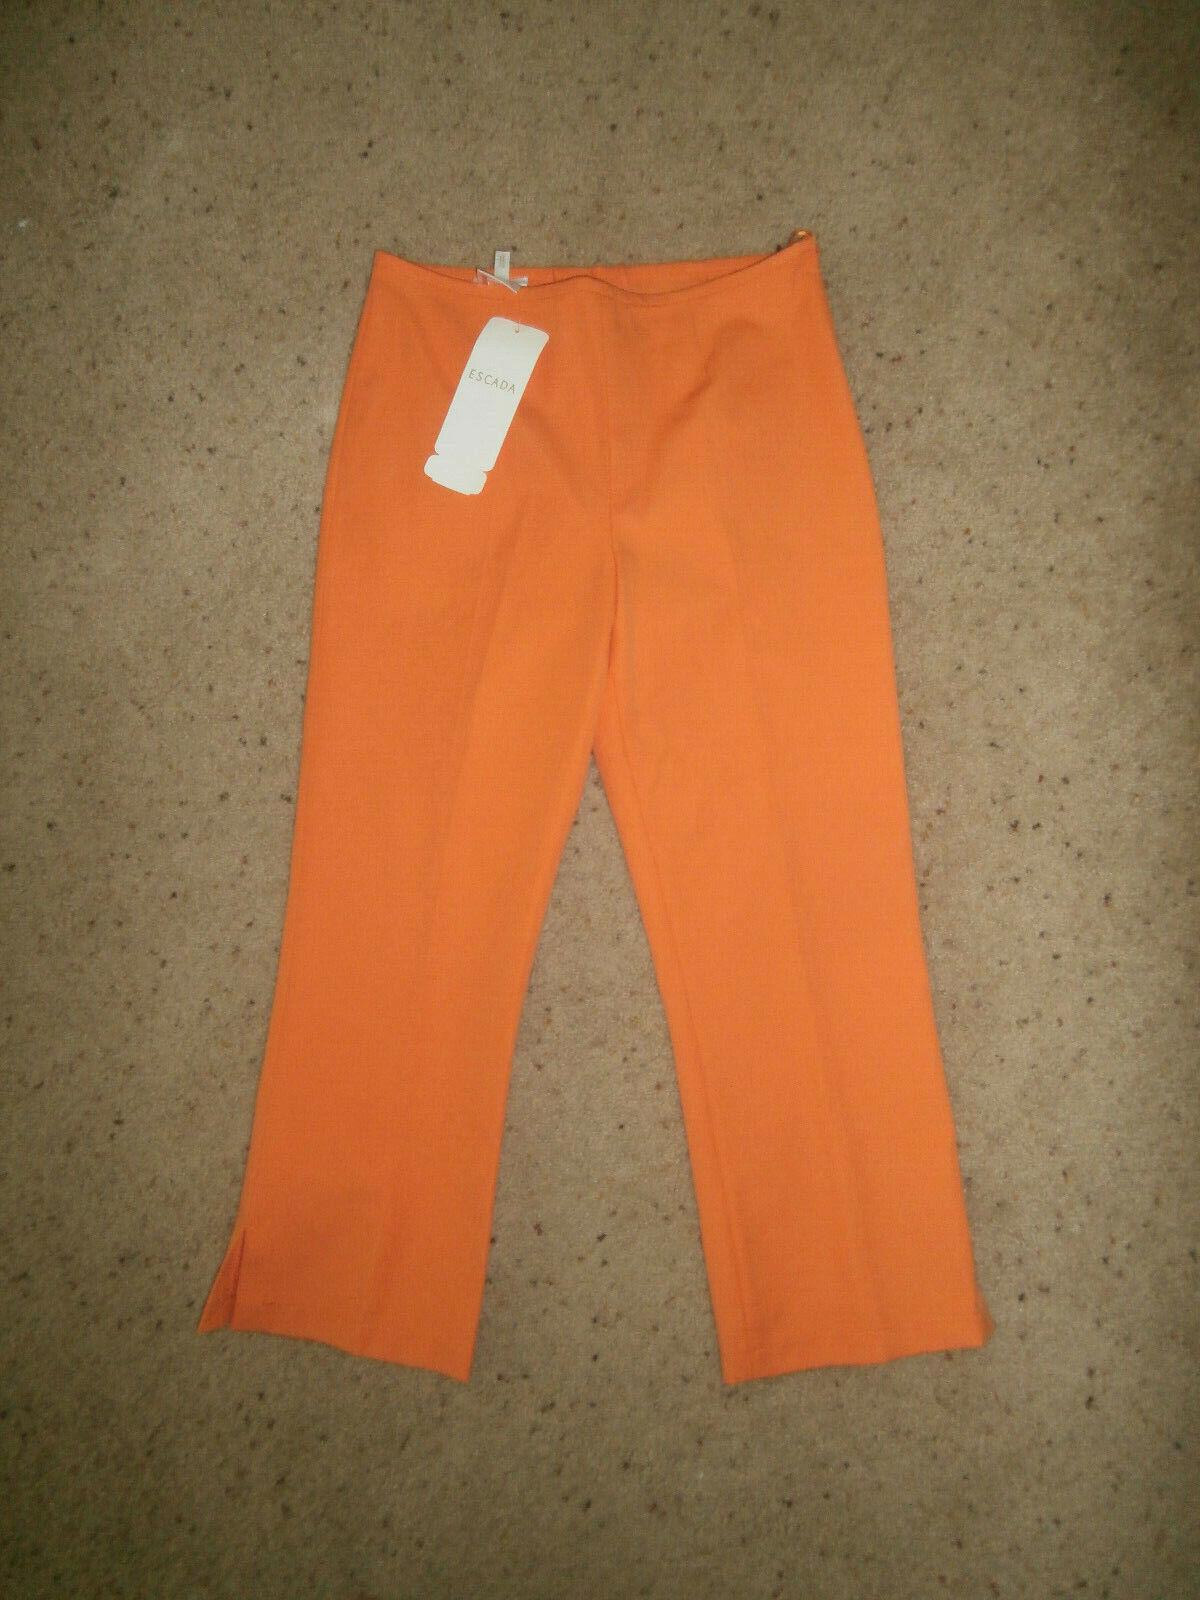 NEW NWT Escada  SZ 6 S 36 CAPRI pants  orange STRETCH